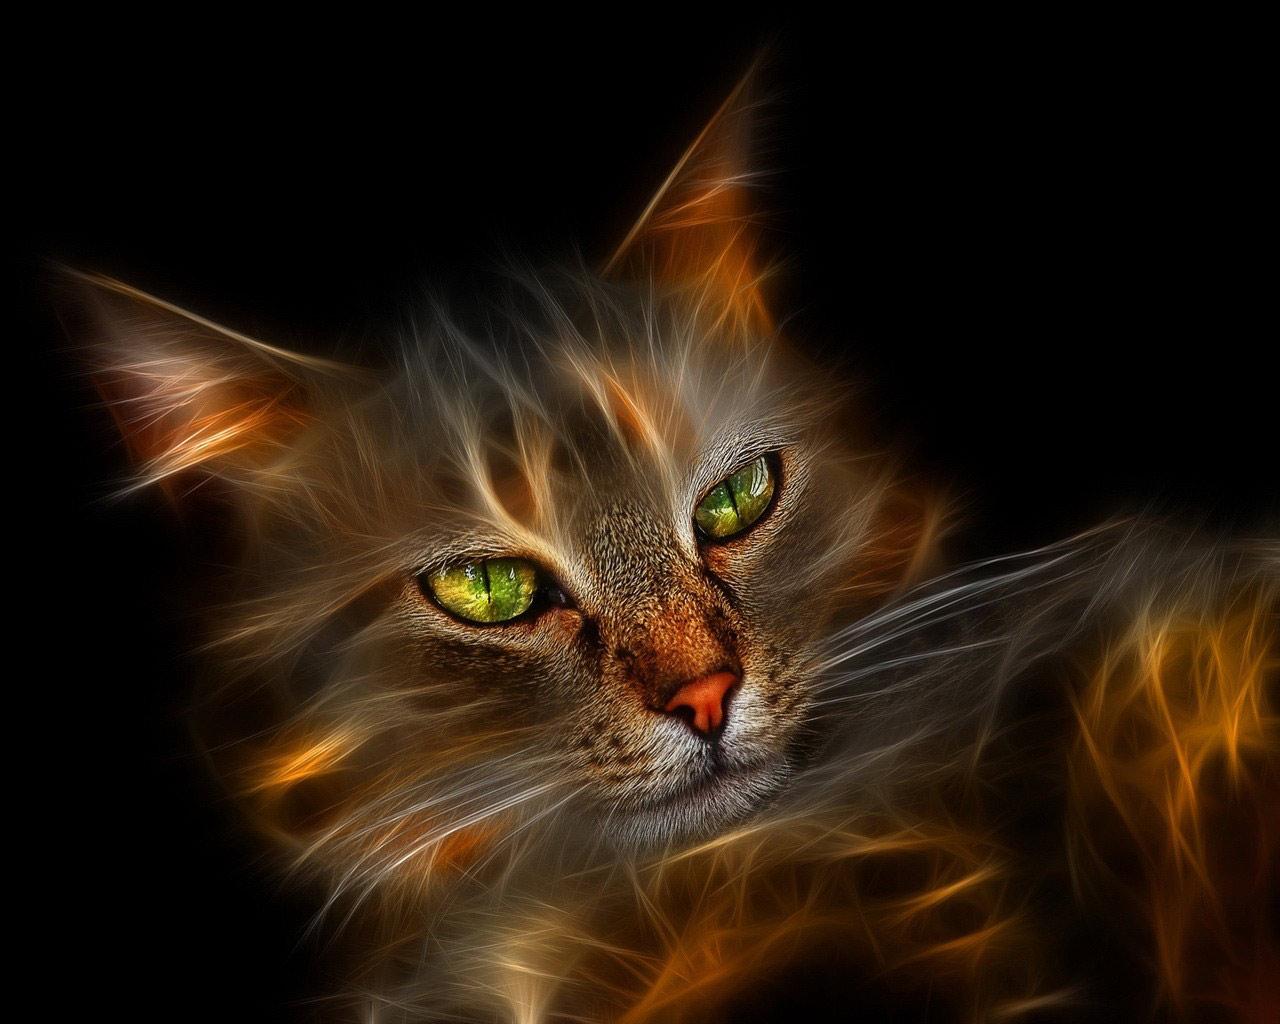 http://1.bp.blogspot.com/-iBe3lNSc520/TdEown5XMyI/AAAAAAAAH1A/oMezN8mC7B8/s1600/Windows_7_Wallpaper_Cat.jpg